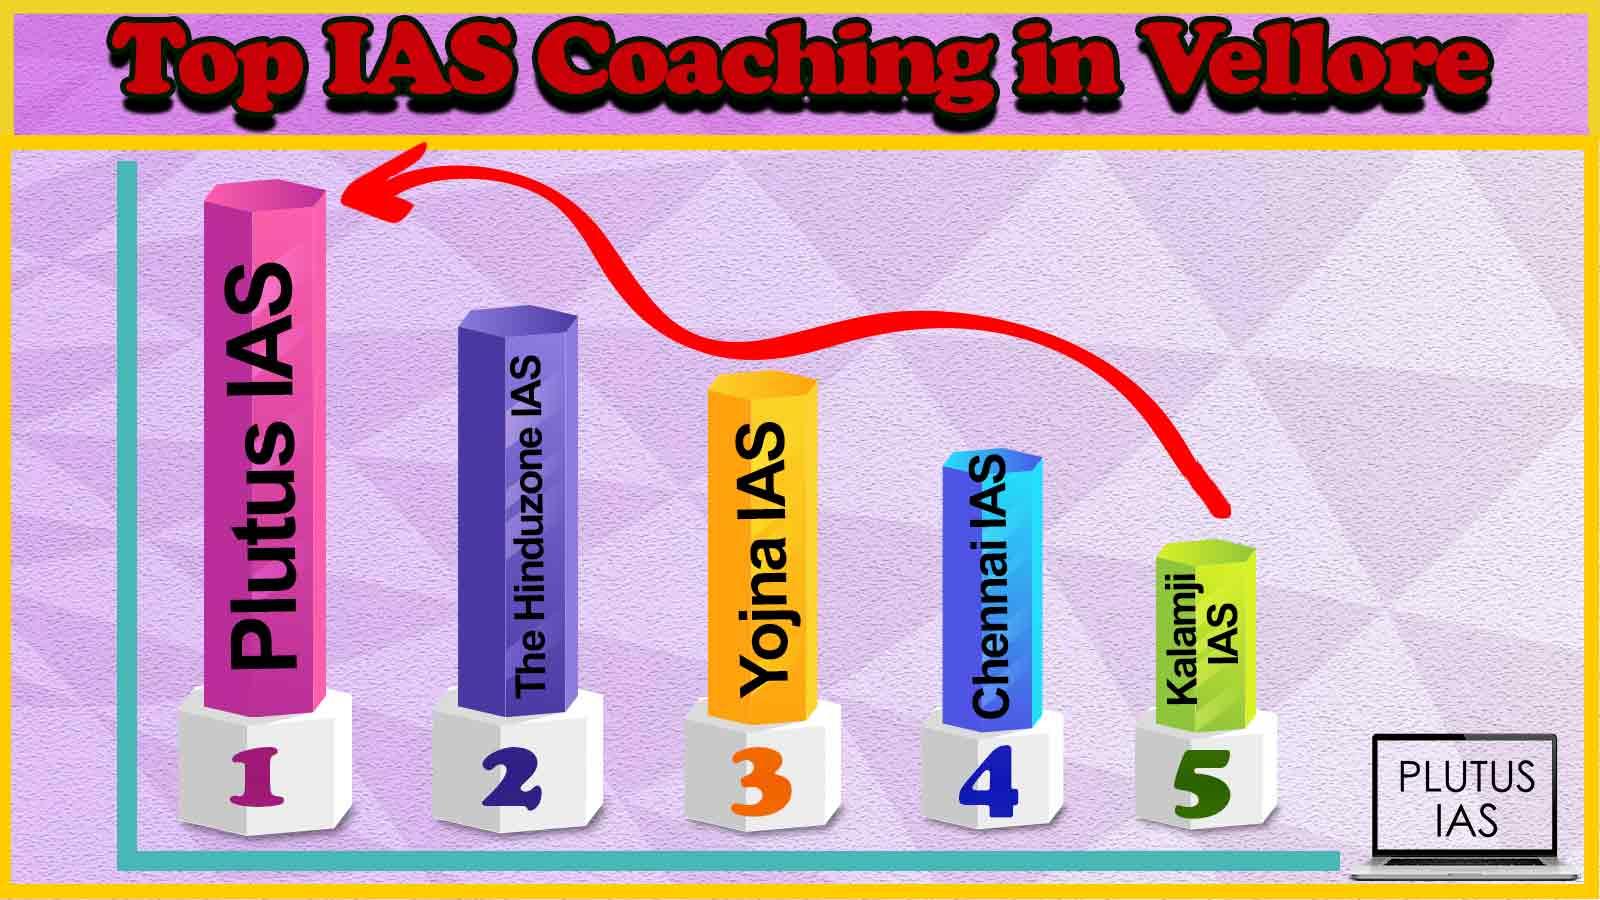 Best 10 IAS Coaching in Vellore